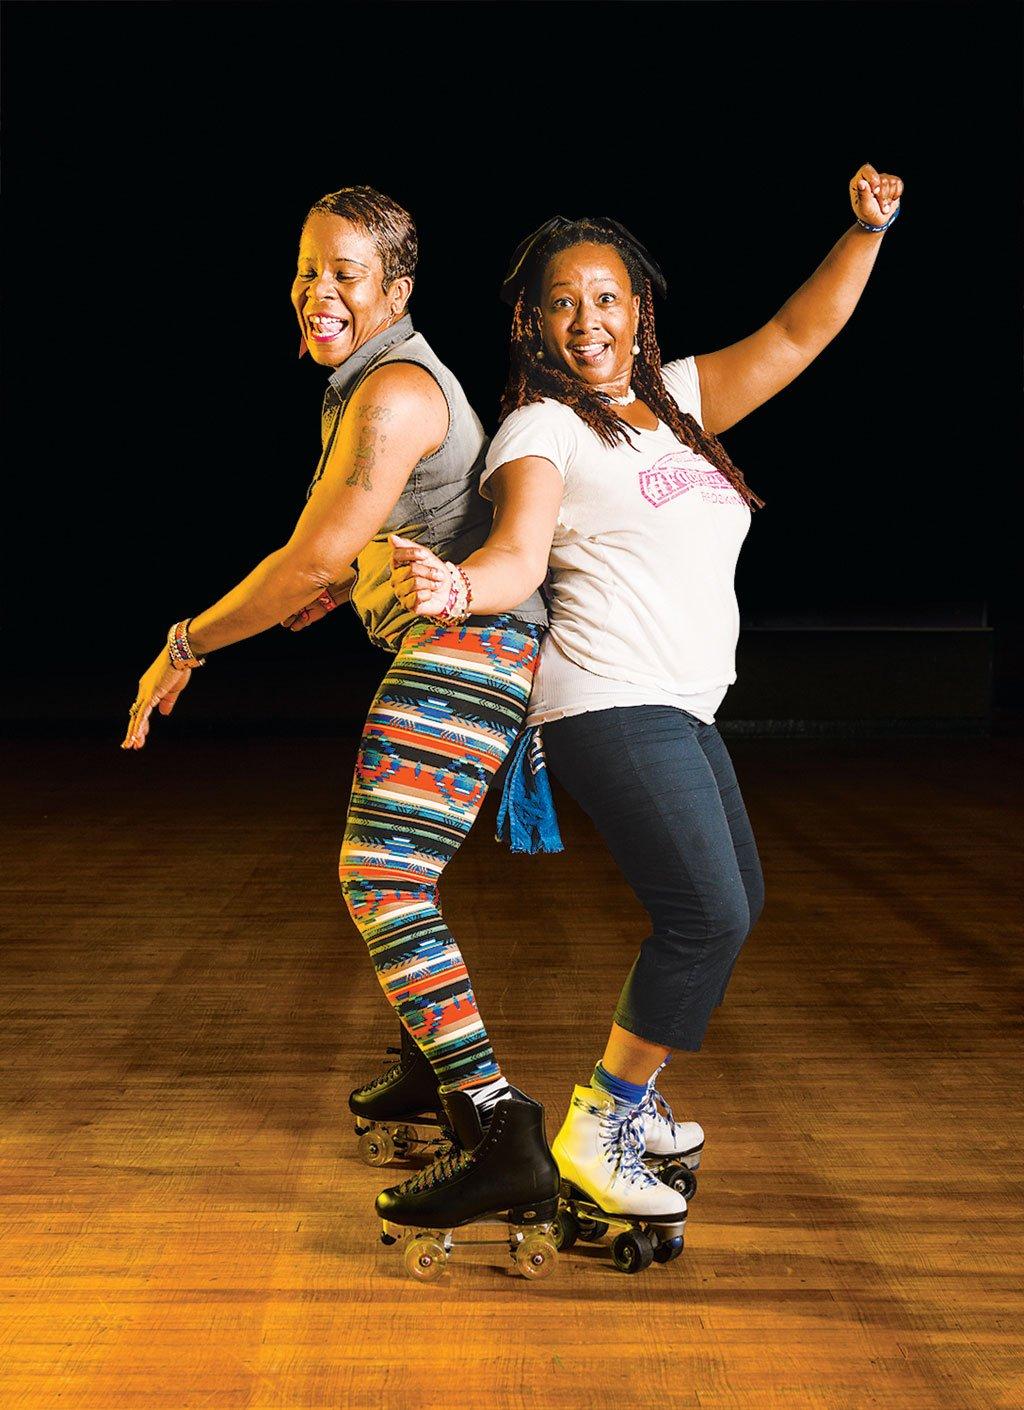 Roller skating rink music - Roller Skating Sharon Kimpson And Lora Fitzgerald